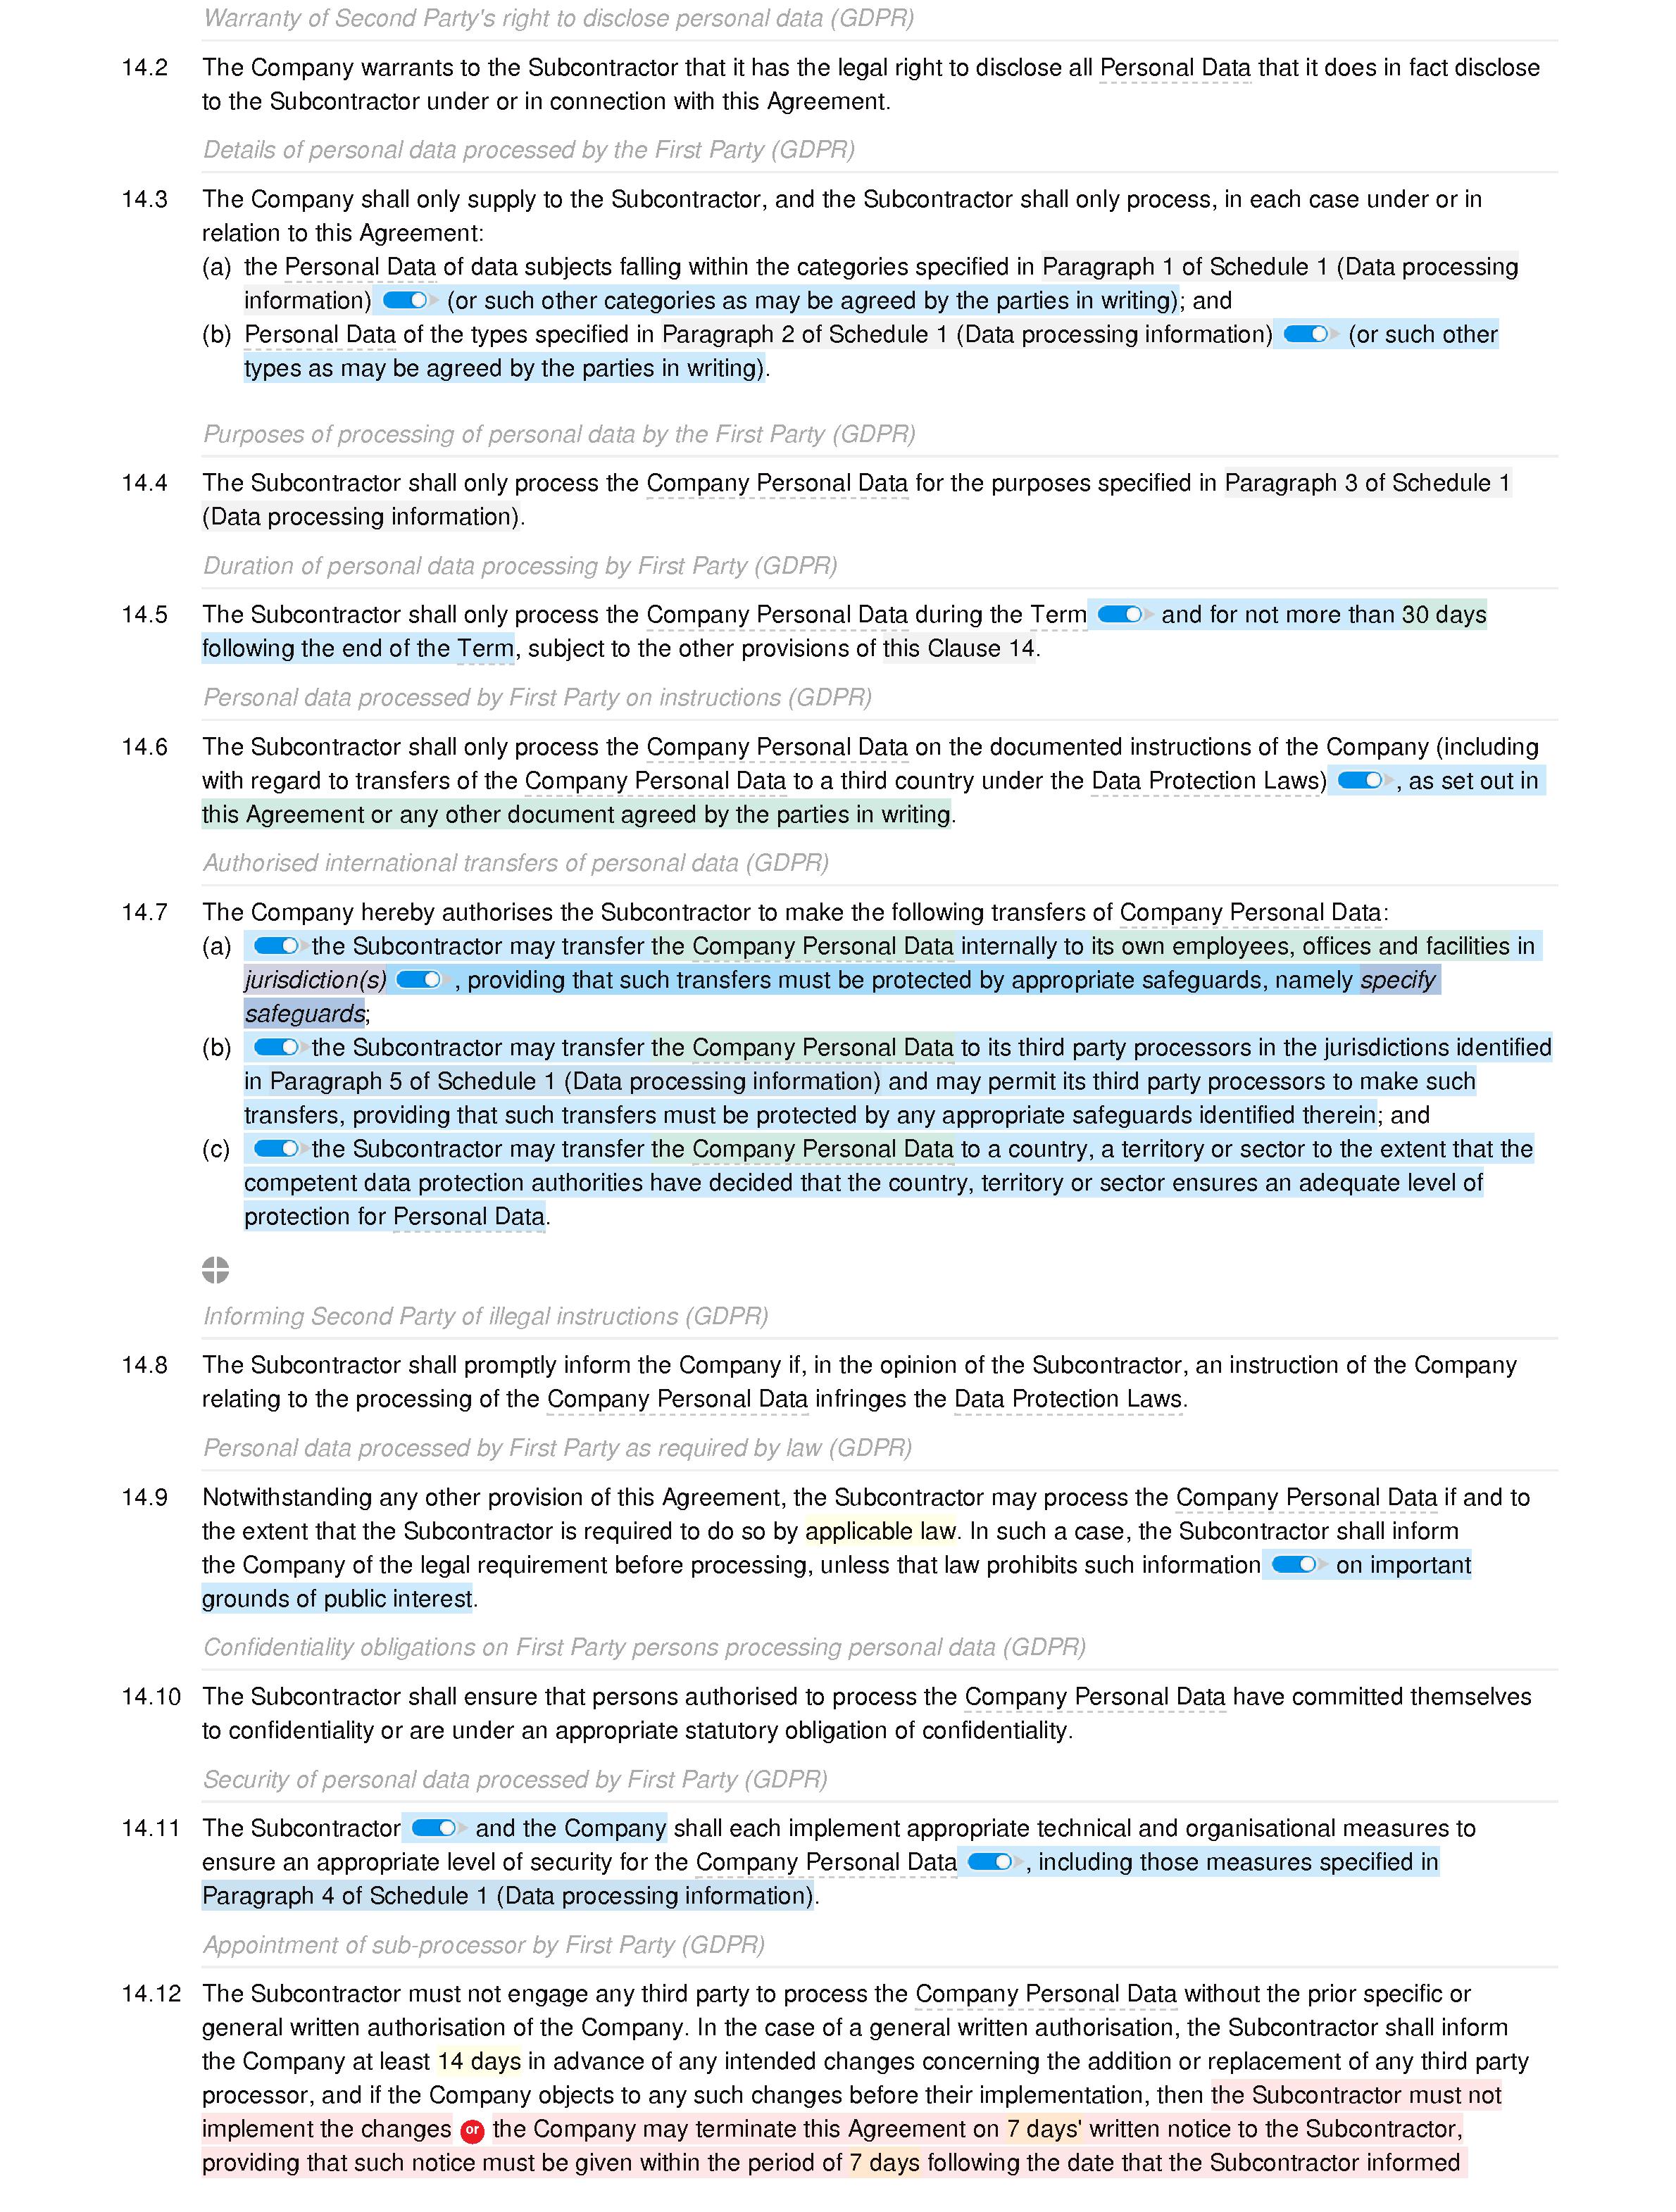 Subcontractor framework agreement (premium) document editor preview